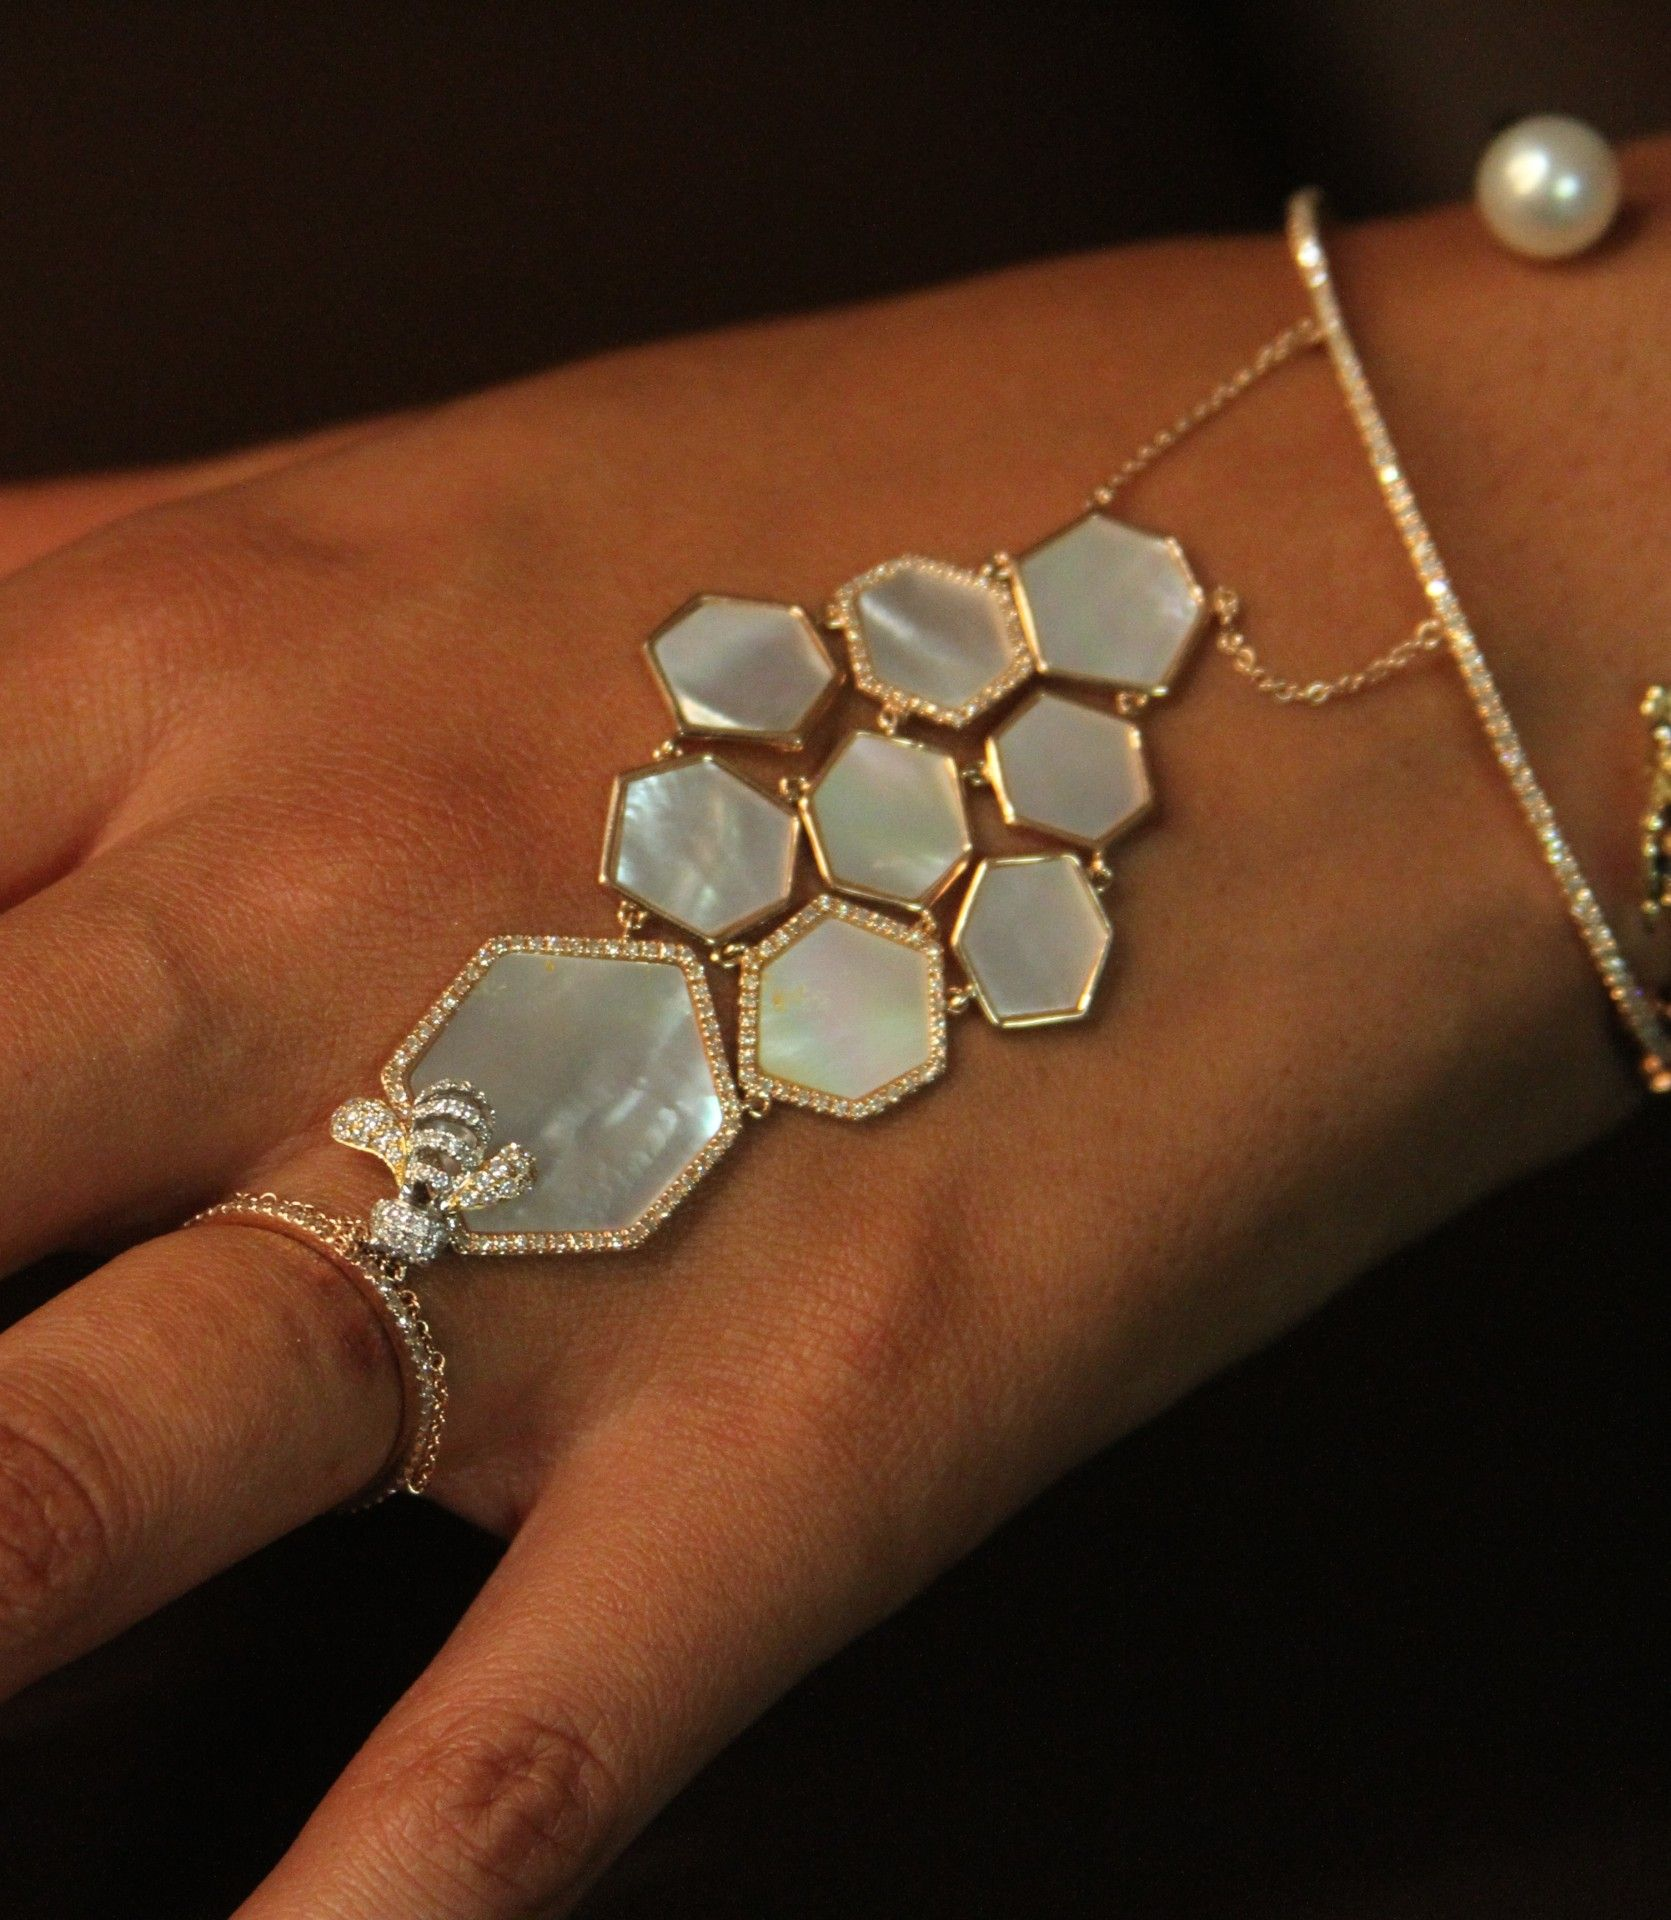 Pin by marija djurkovic on inspirational board pinterest